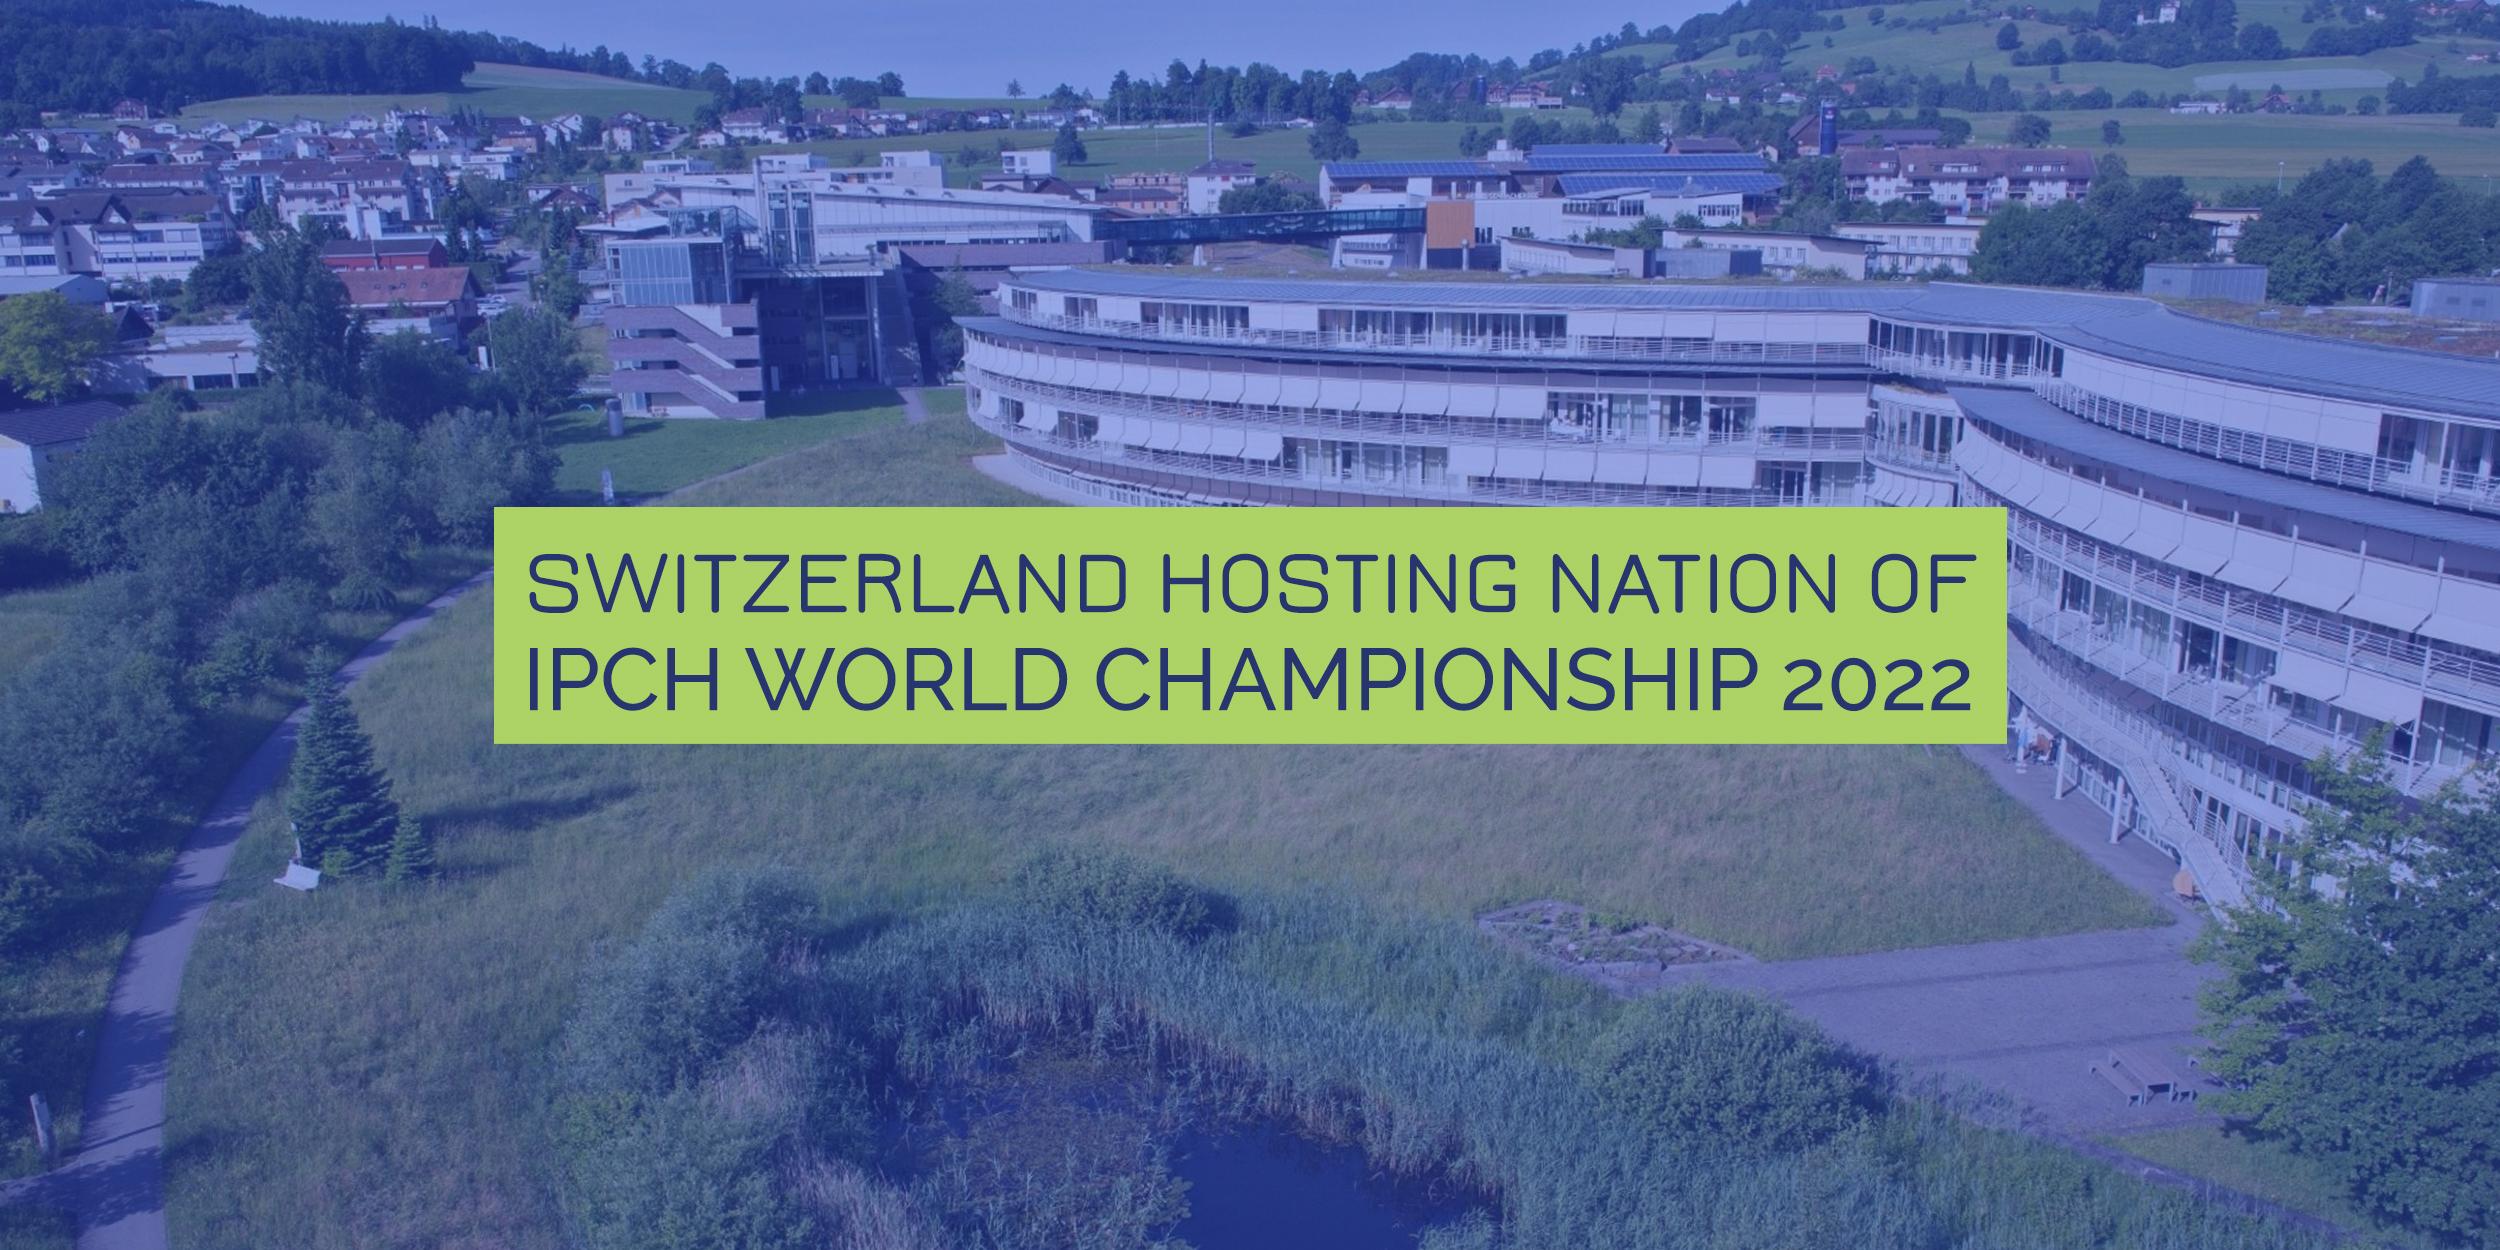 Švýcarsko bude hostit Mistrovství světa v Powerchair Hockey 2022.